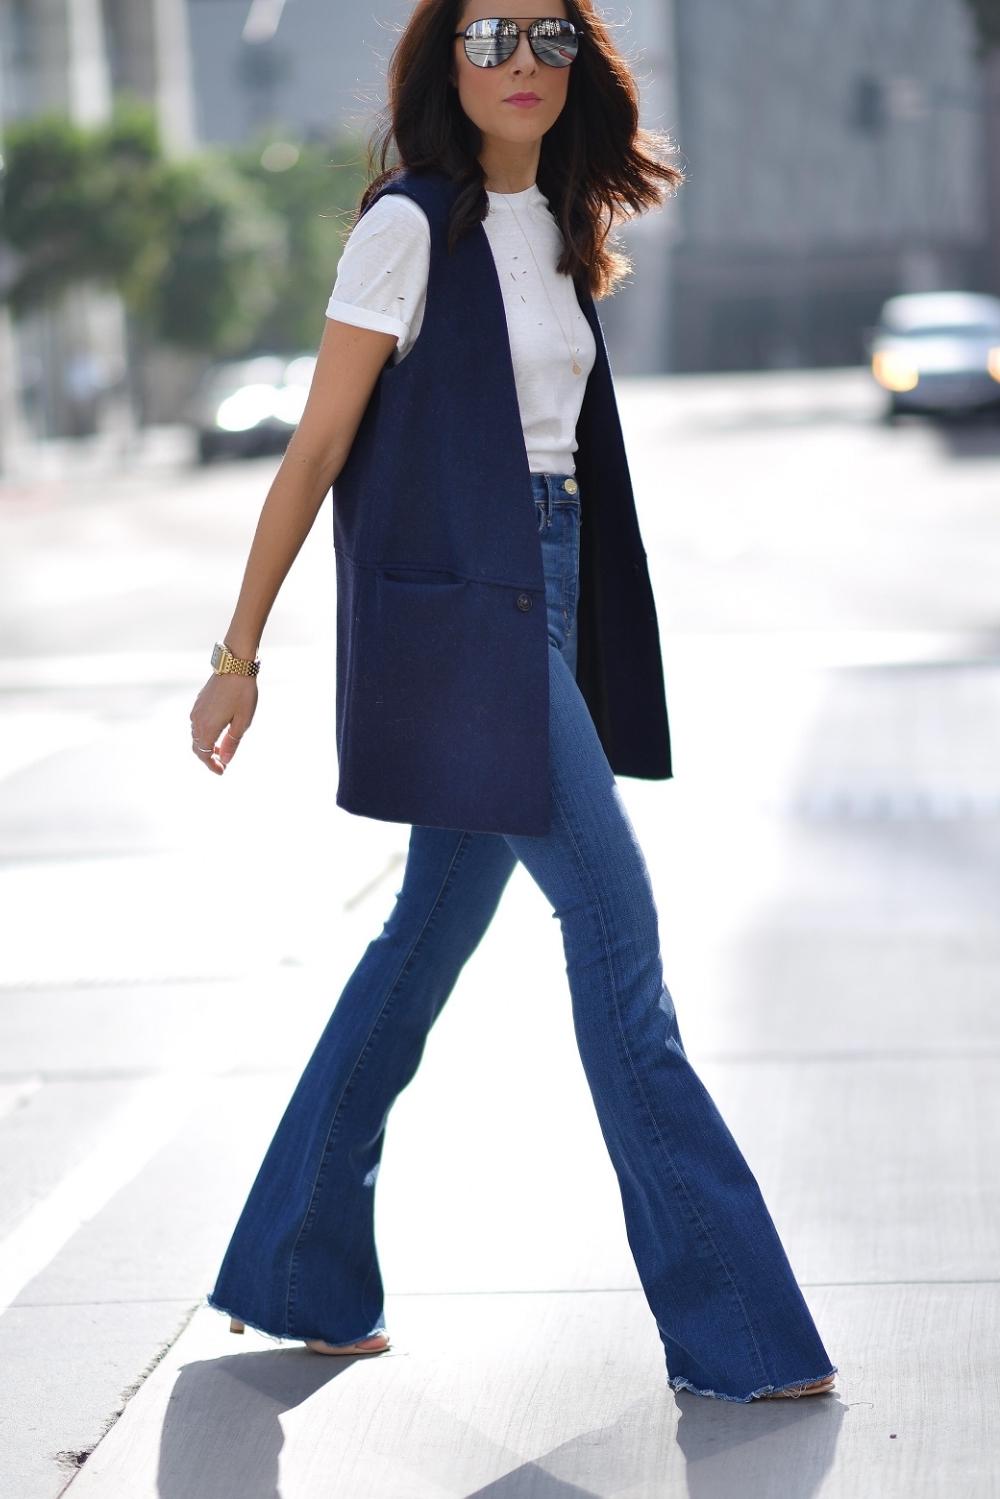 McGuireDenim_FashionBLogger_Zara_SaintLaurent_SanDiego_Streetstyle_LucysWhims.jpg